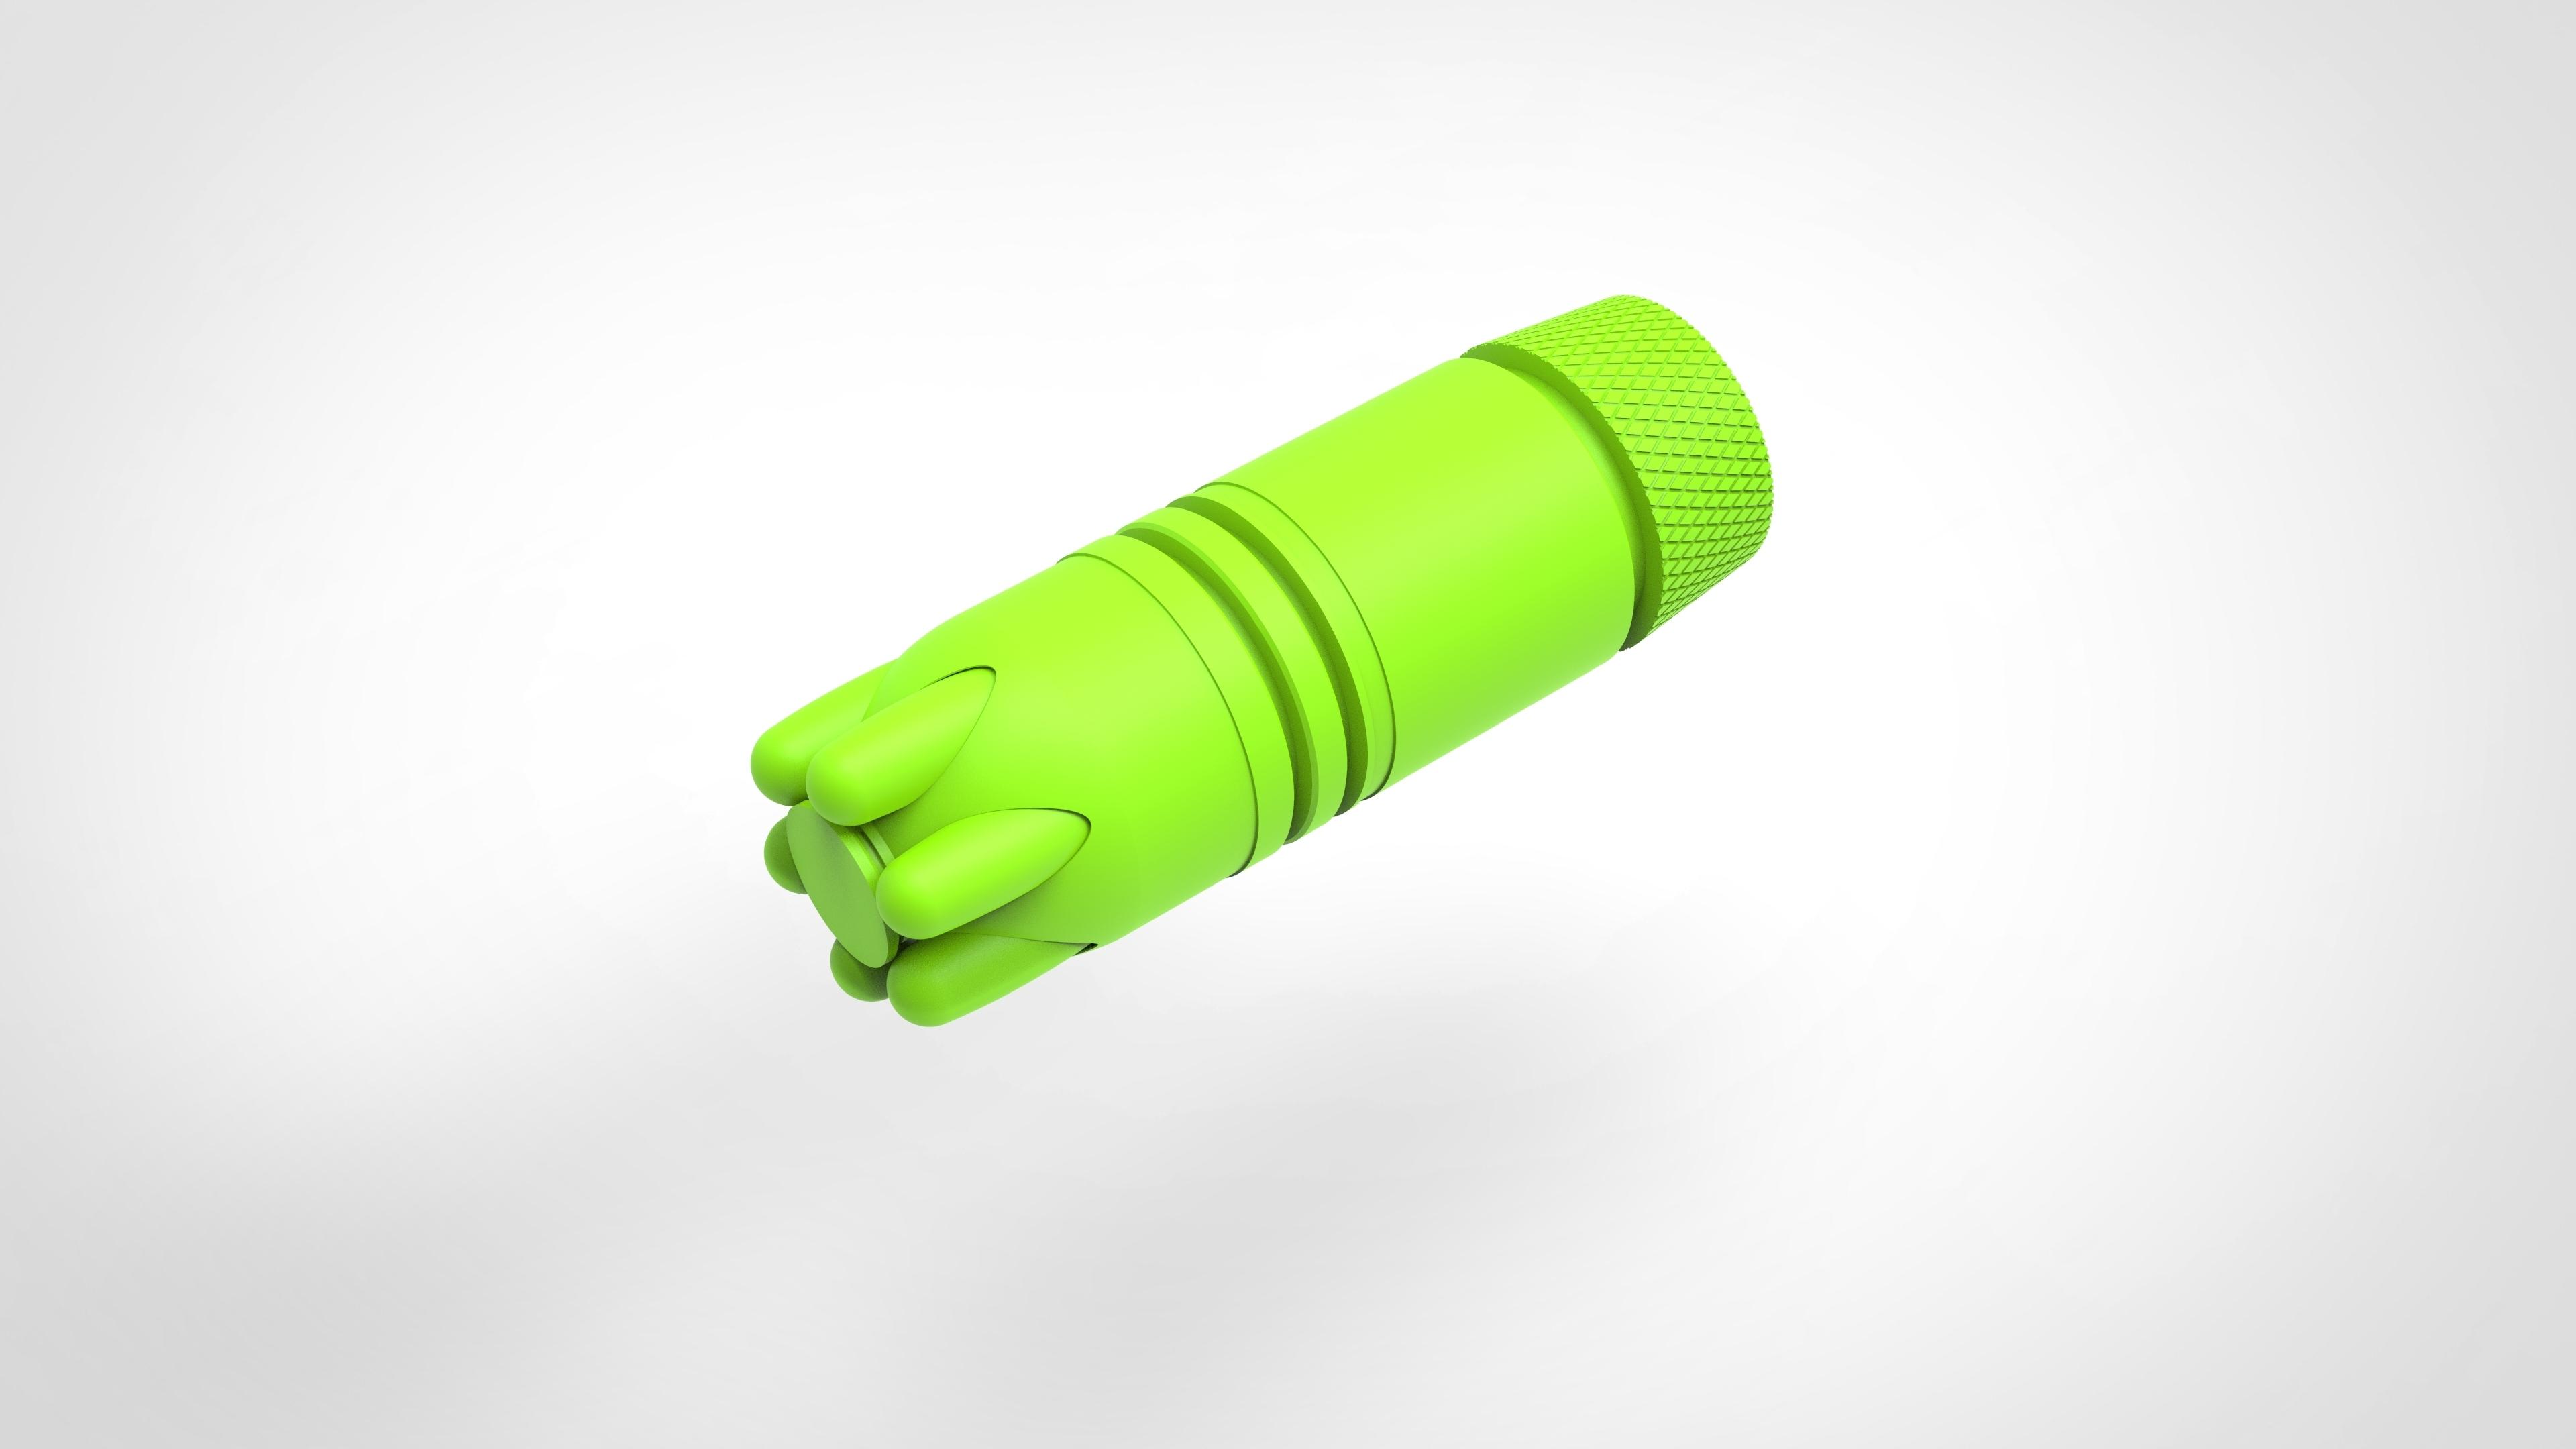 023.jpg Download 3MF file Glue grenade from the video game Batman: Arkham Origins • 3D printer model, vetrock